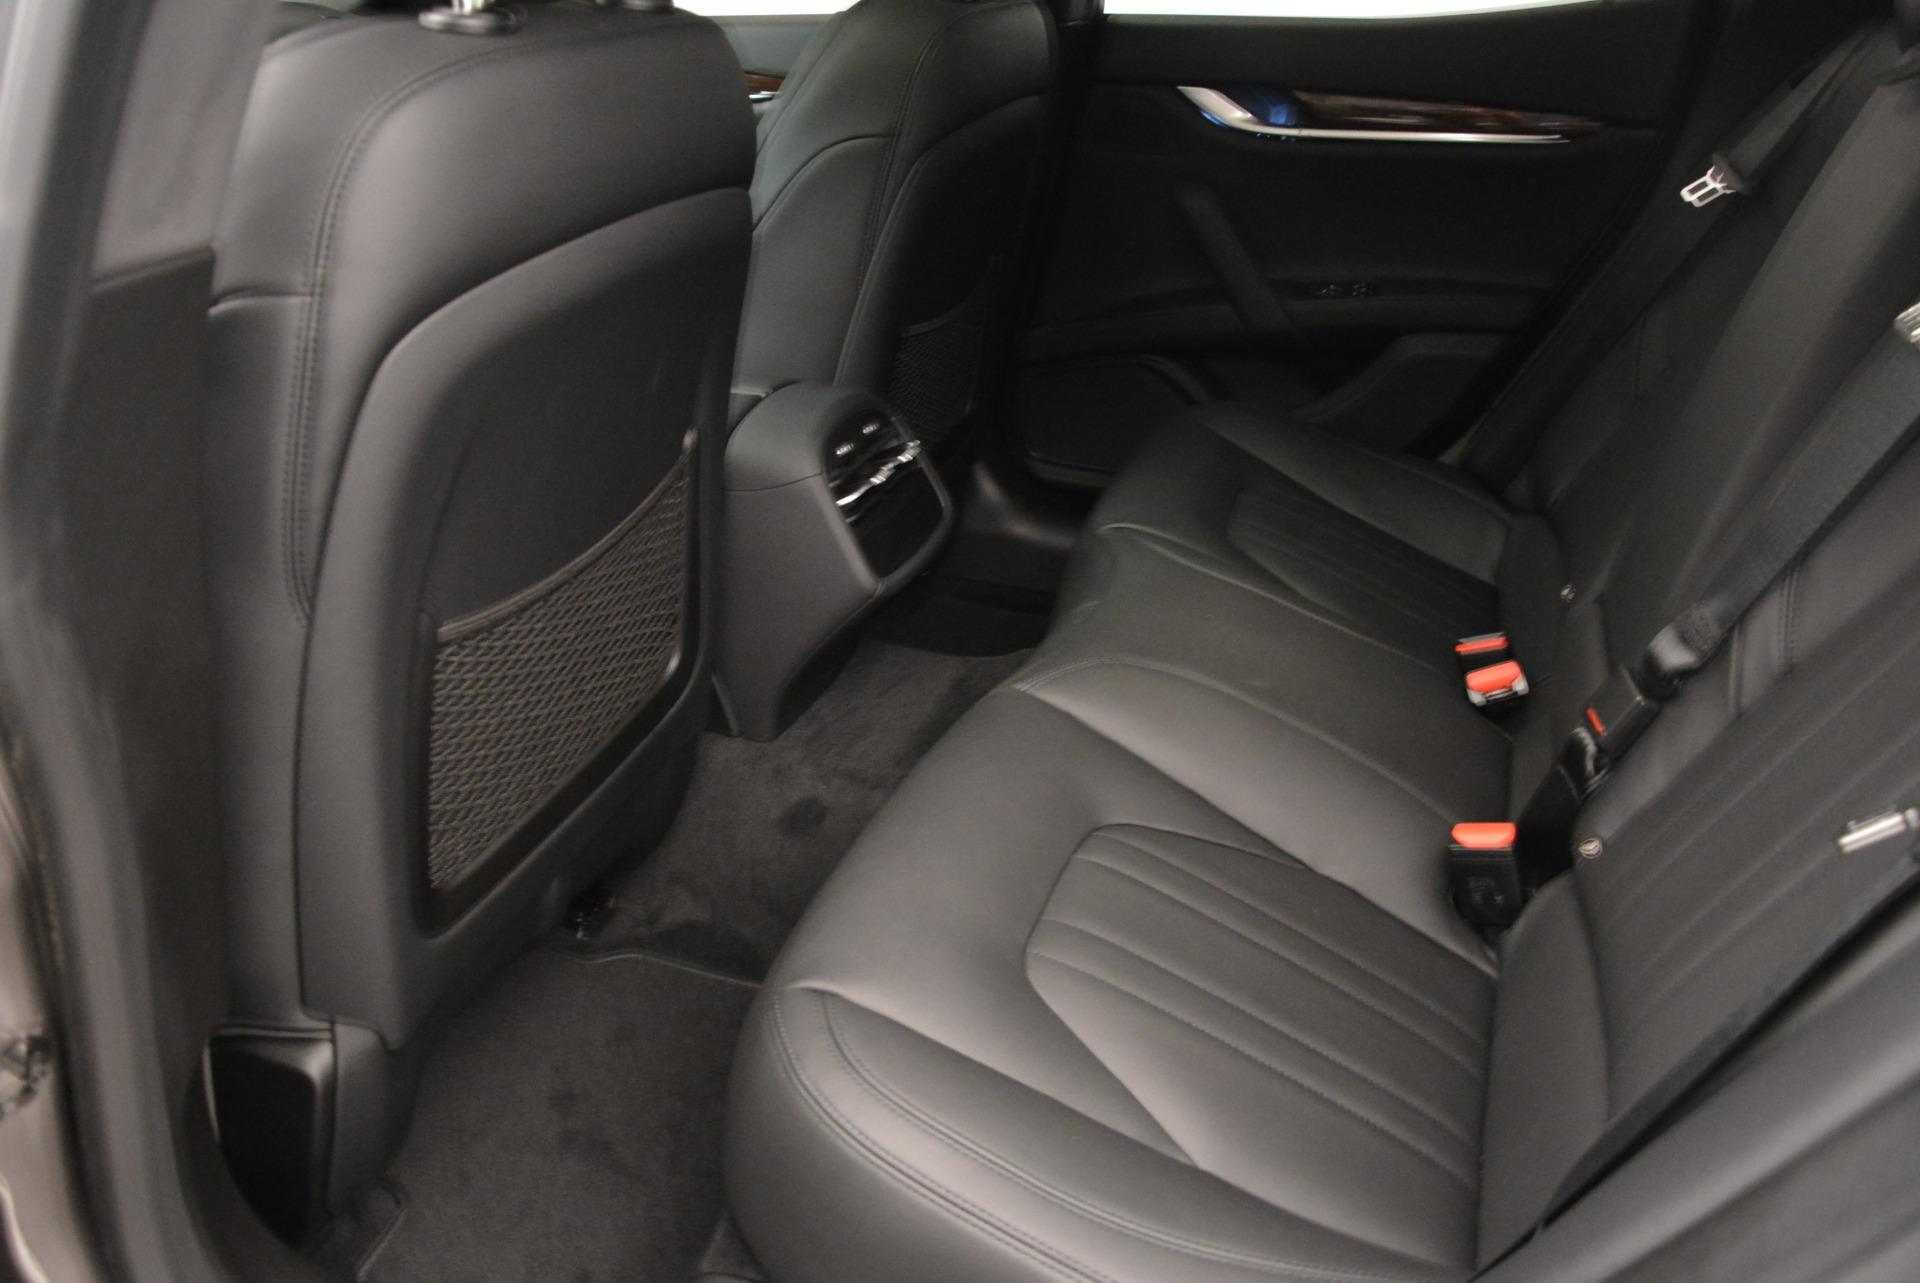 Used 2014 Maserati Ghibli S Q4 For Sale In Greenwich, CT. Alfa Romeo of Greenwich, 7426 2562_p18